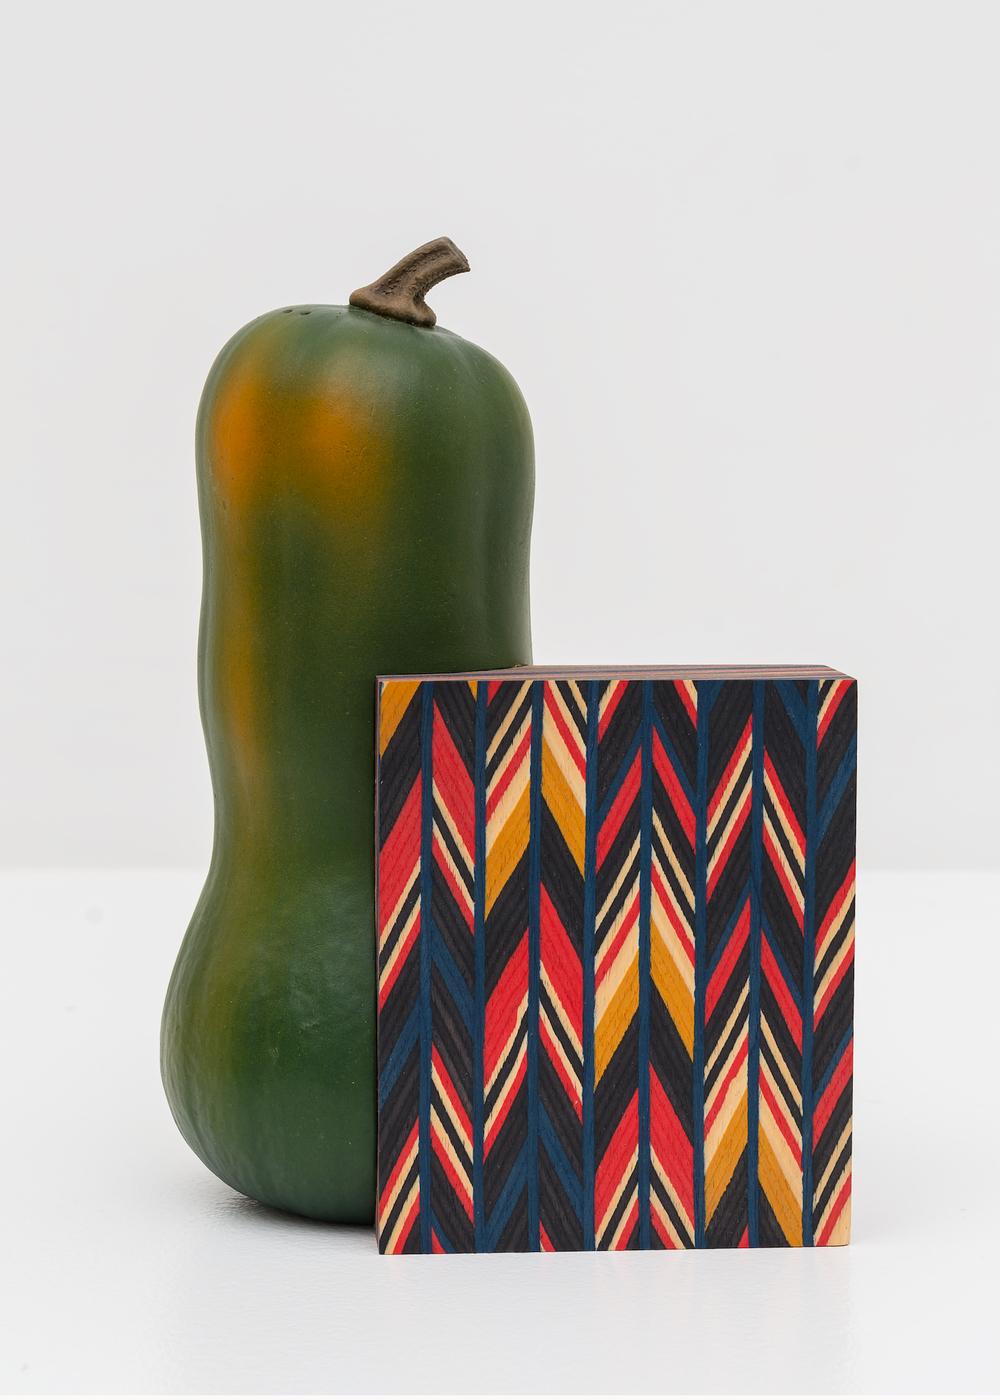 Frank Benson Untitled (Aztec) 2011 11h x 7 1/2w x 4 1/2d in Cast plastic, acrylic paint, wood, polyurethane, MDF FB001